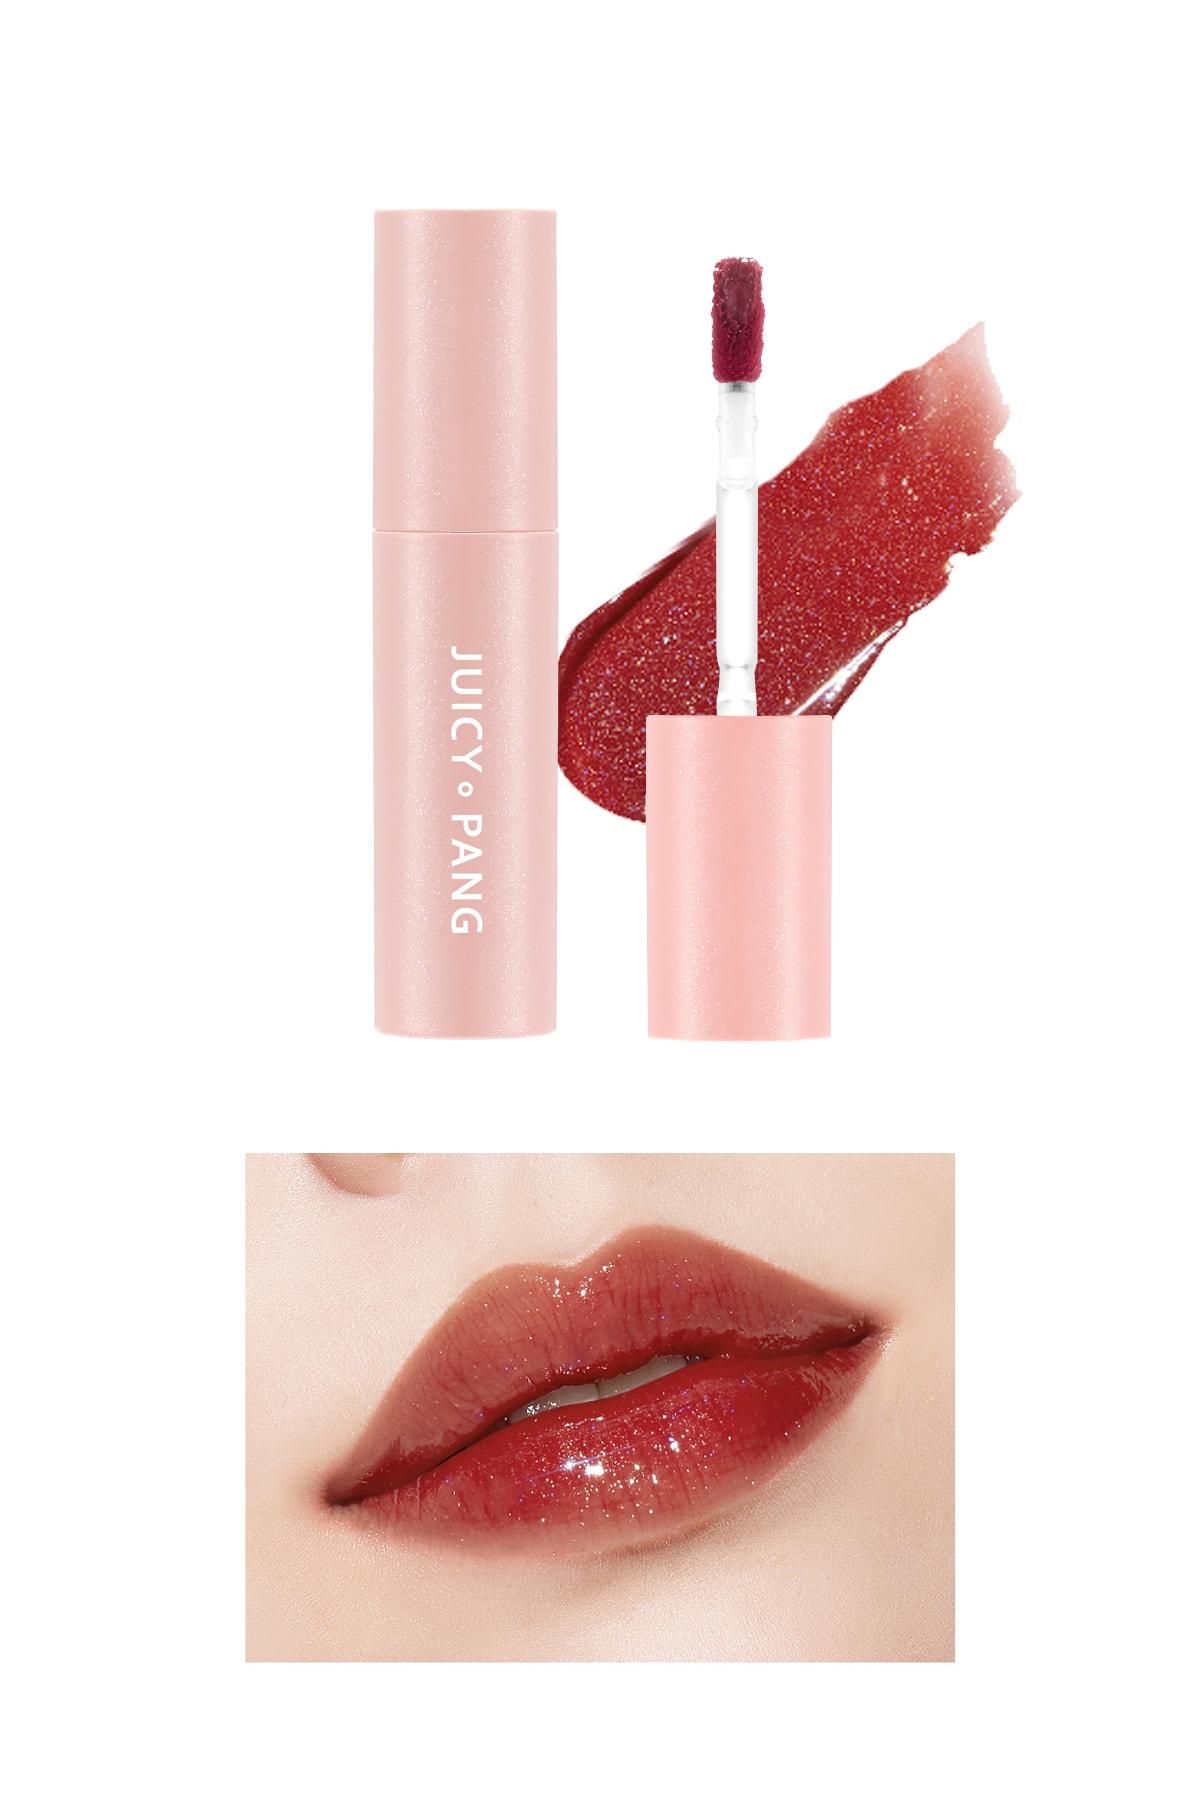 Missha Işıltı&Dolgunluk Veren Parlak Gloss Tint APIEU Juicy-Pang Sparkling Tint RD01